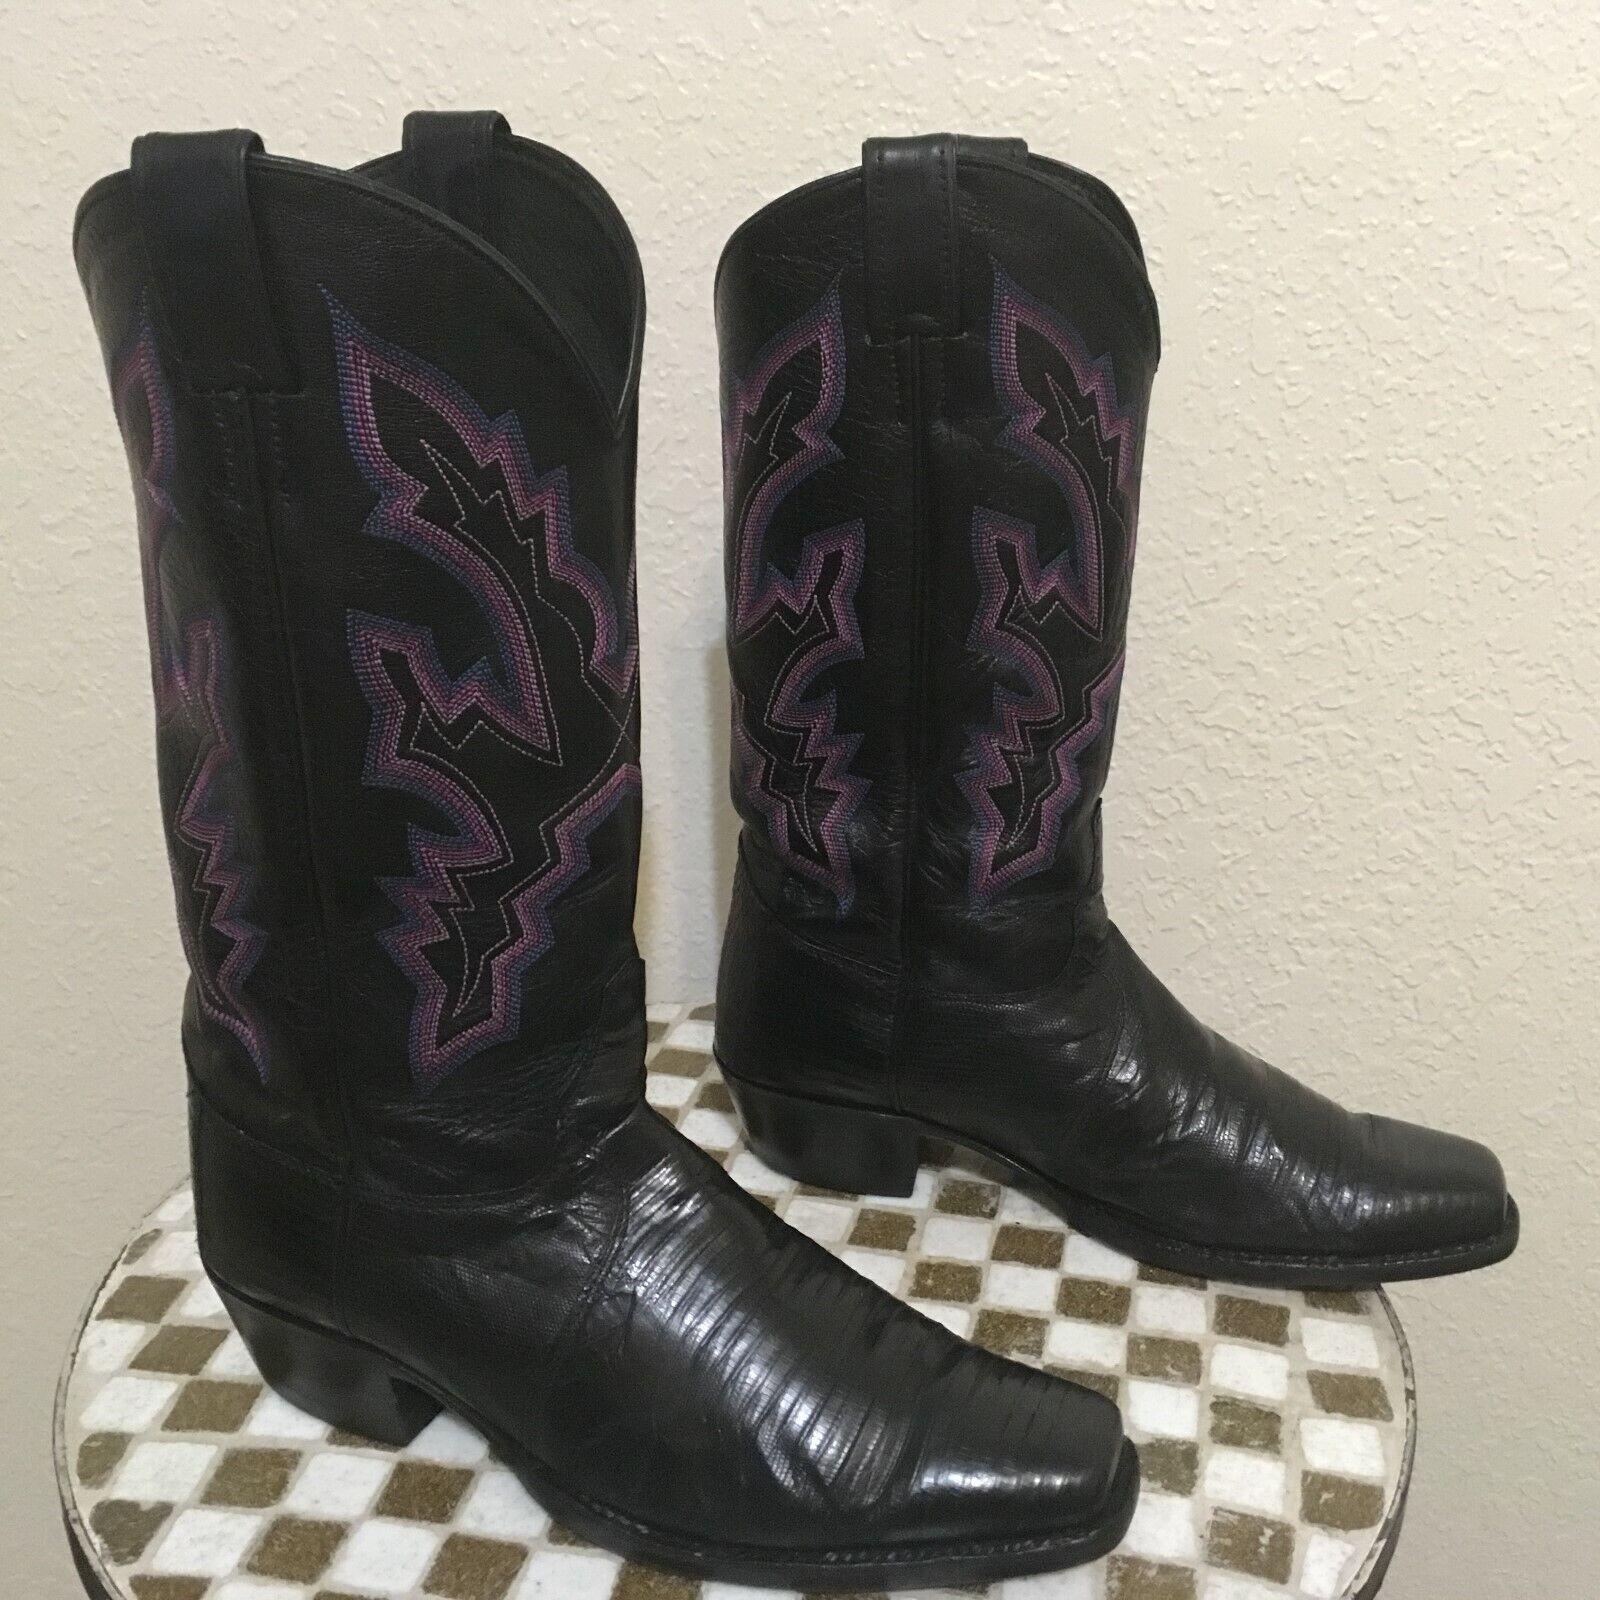 LIZARD USA JUSTIN ROCKABILLY BLACK  WESTERN COWBOY TRAIL BOSS BOOTS 9.5 D